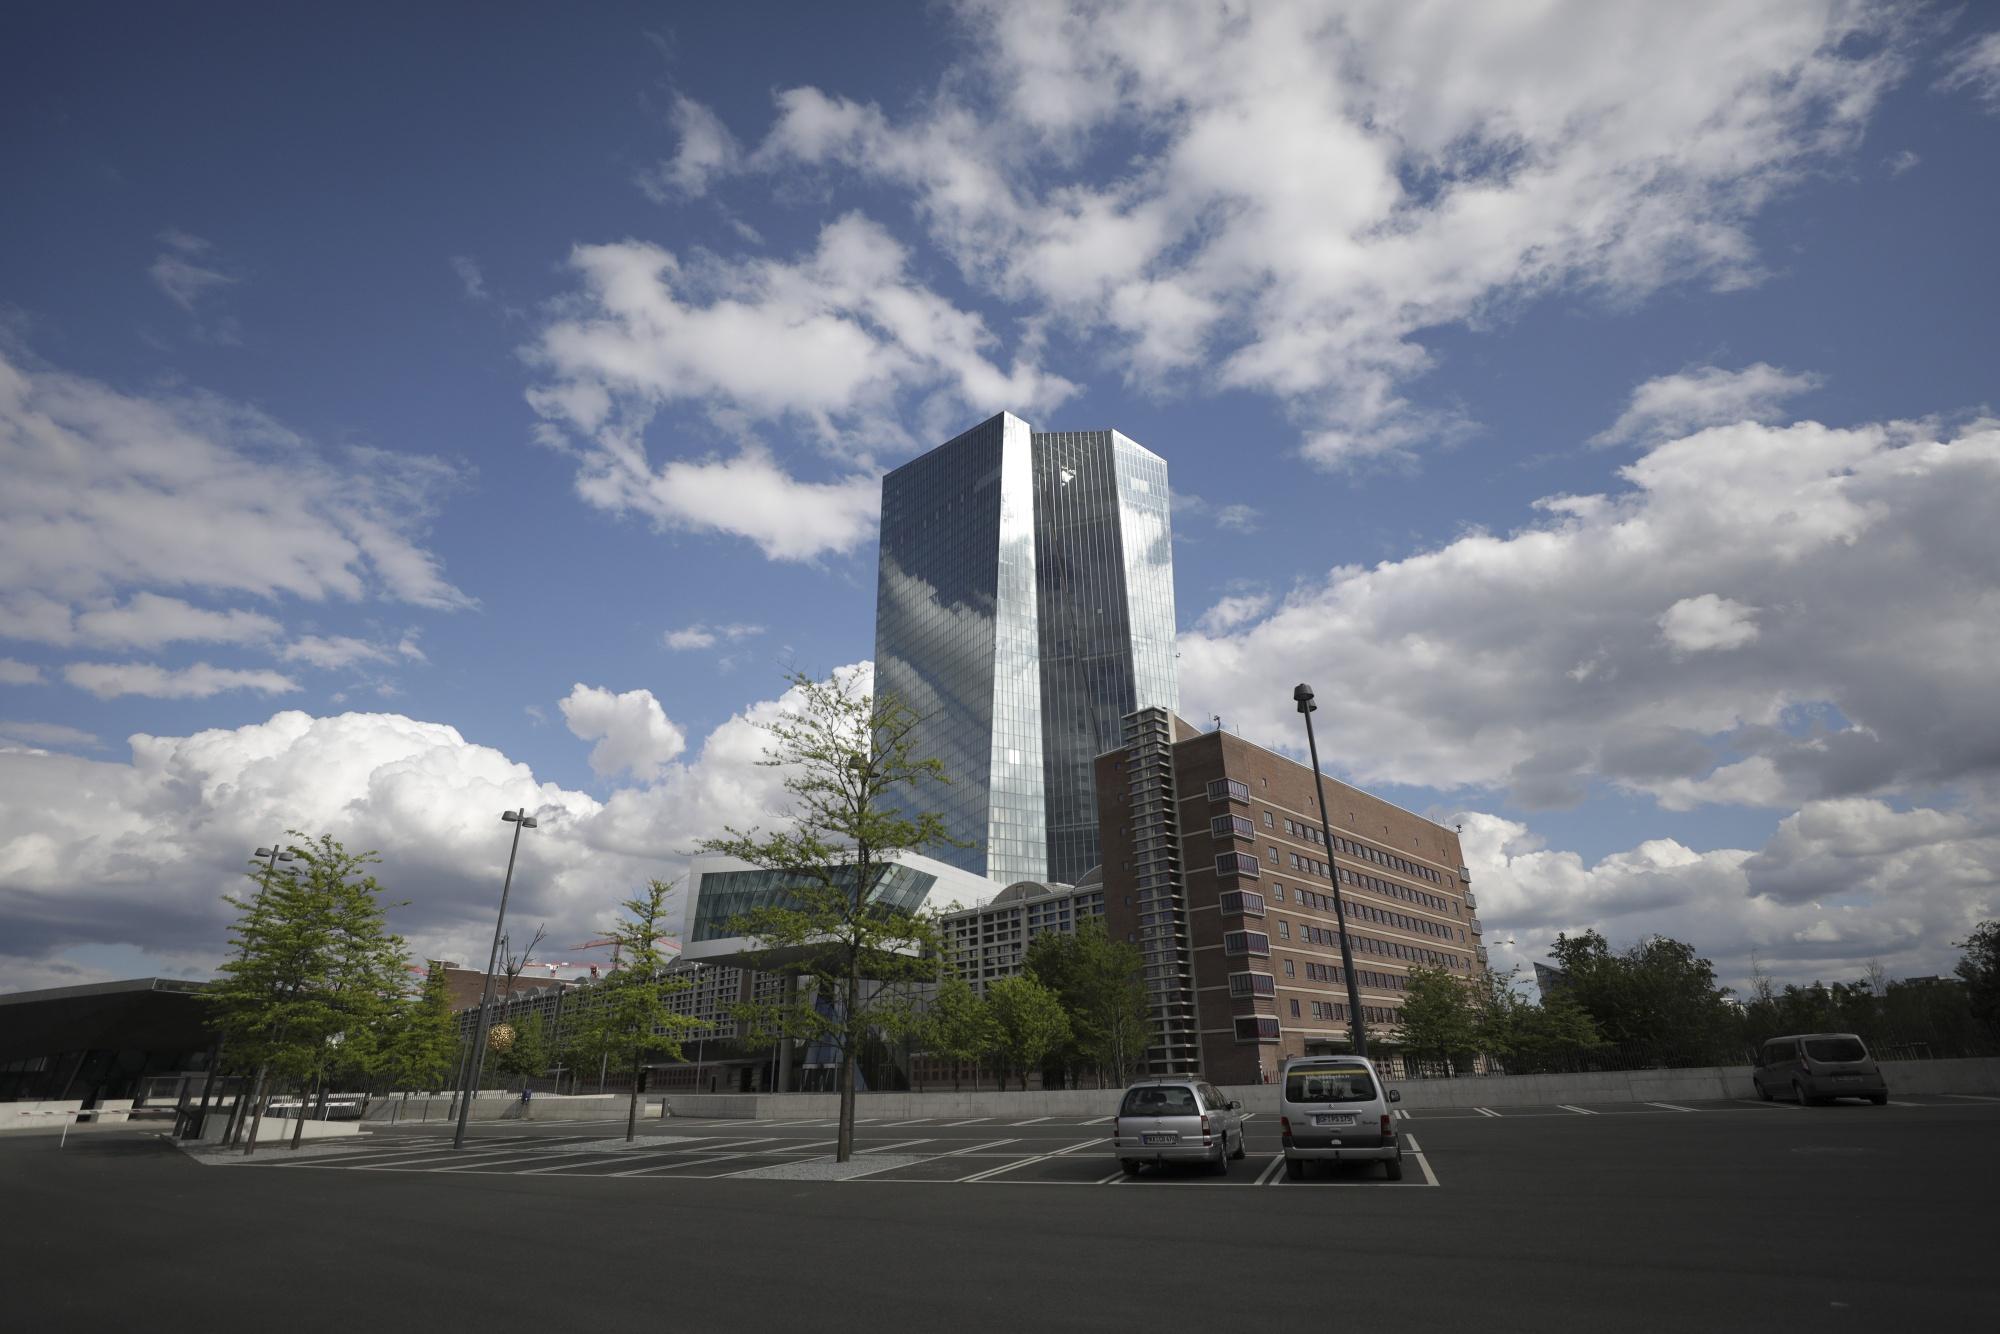 TheEuropean Central Bankheadquarters in Frankfurt.